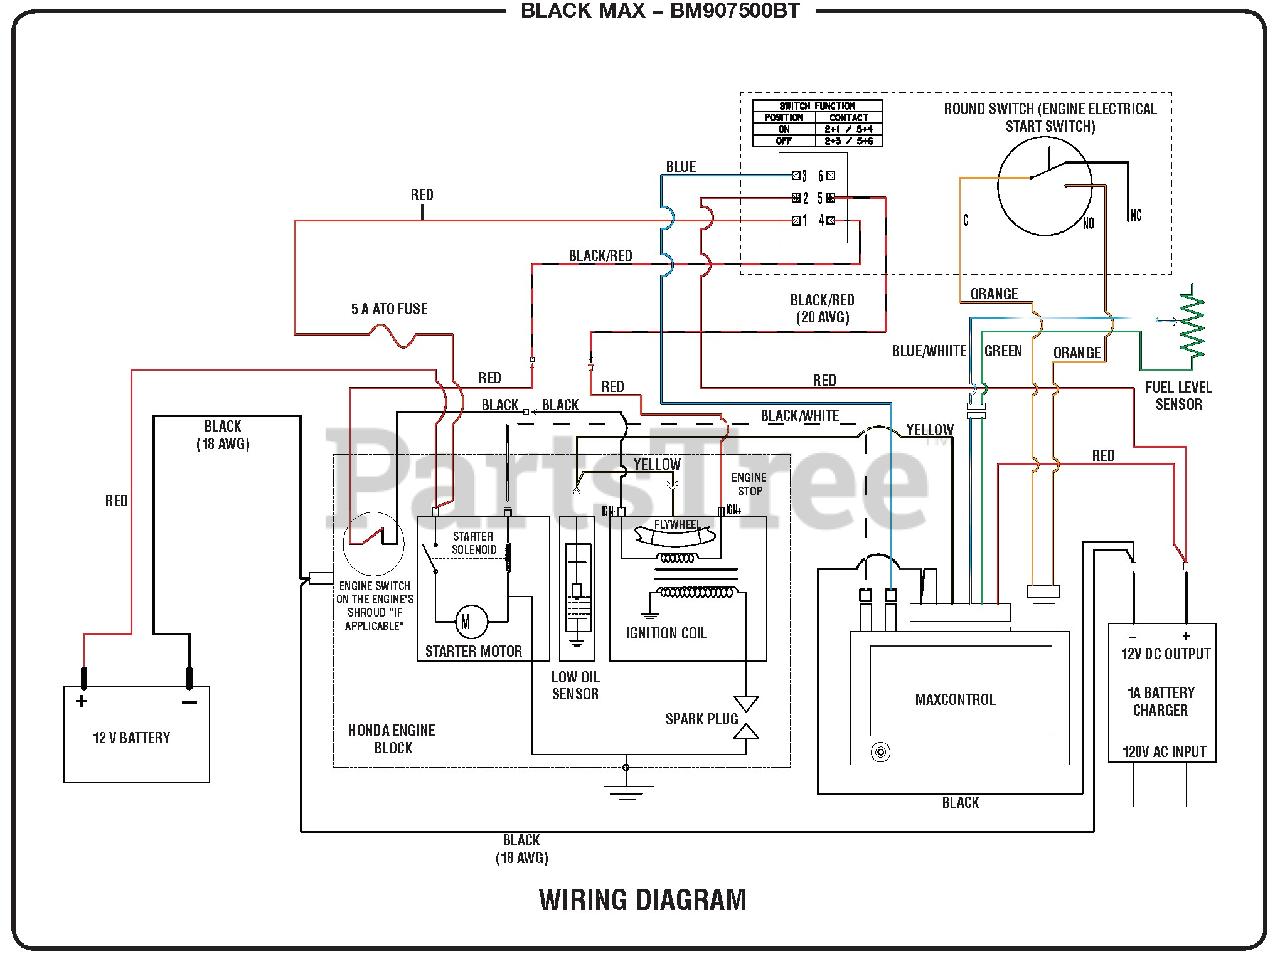 Diagram Mercury Xr4 Wiring Diagram Full Version Hd Quality Wiring Diagram Schematictv2h Romaindanza It